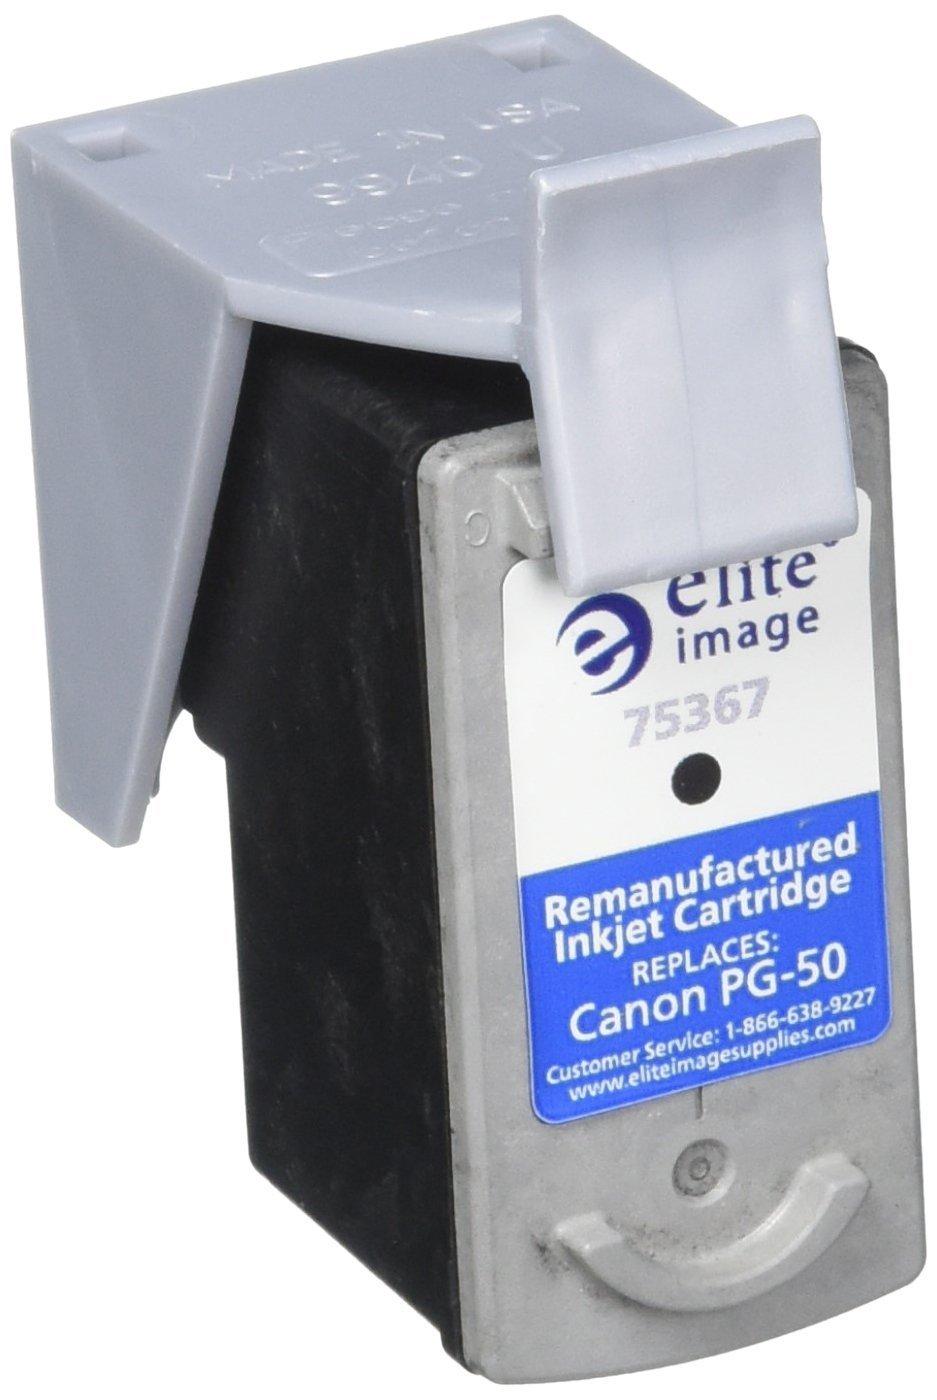 Elite Image Hình ảnh tinh nhuệ eli75367 75367 JNK cartridge